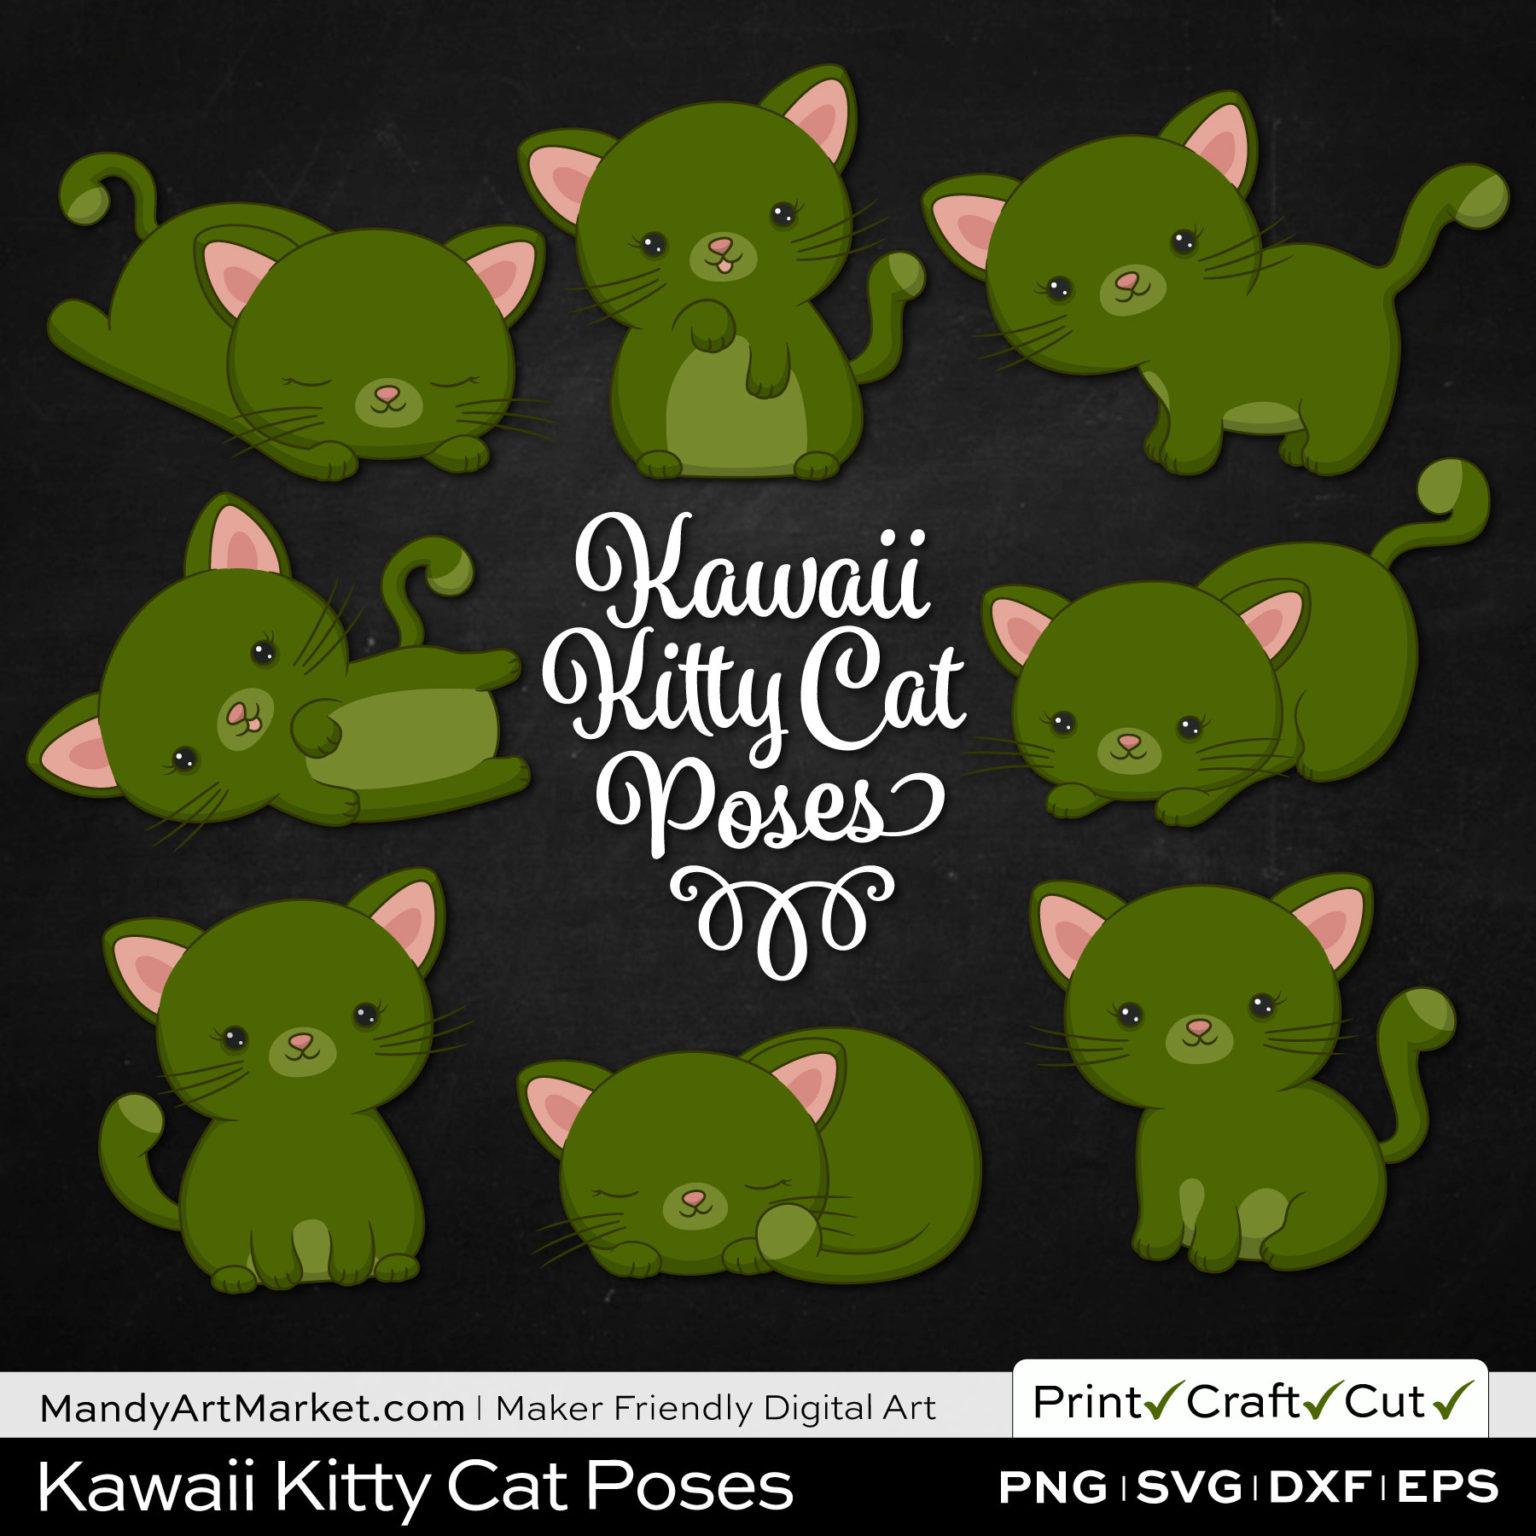 Dark Moss Green Kawaii Kitty Cat Poses Clipart on Black Background